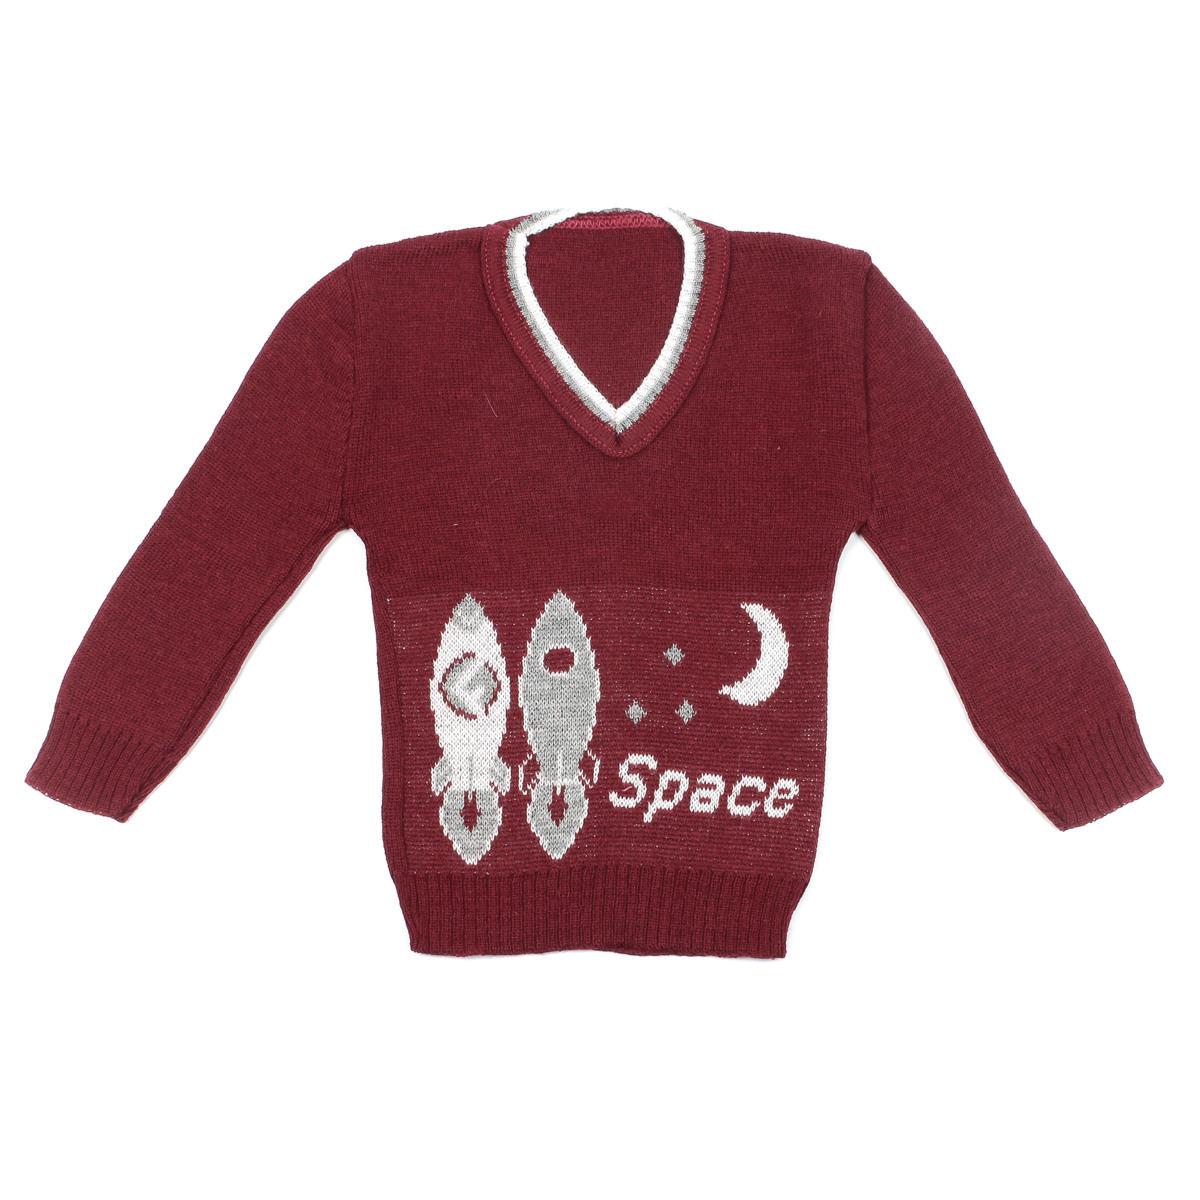 BLUSA INFANTIL GOLA V SPACE MENINO